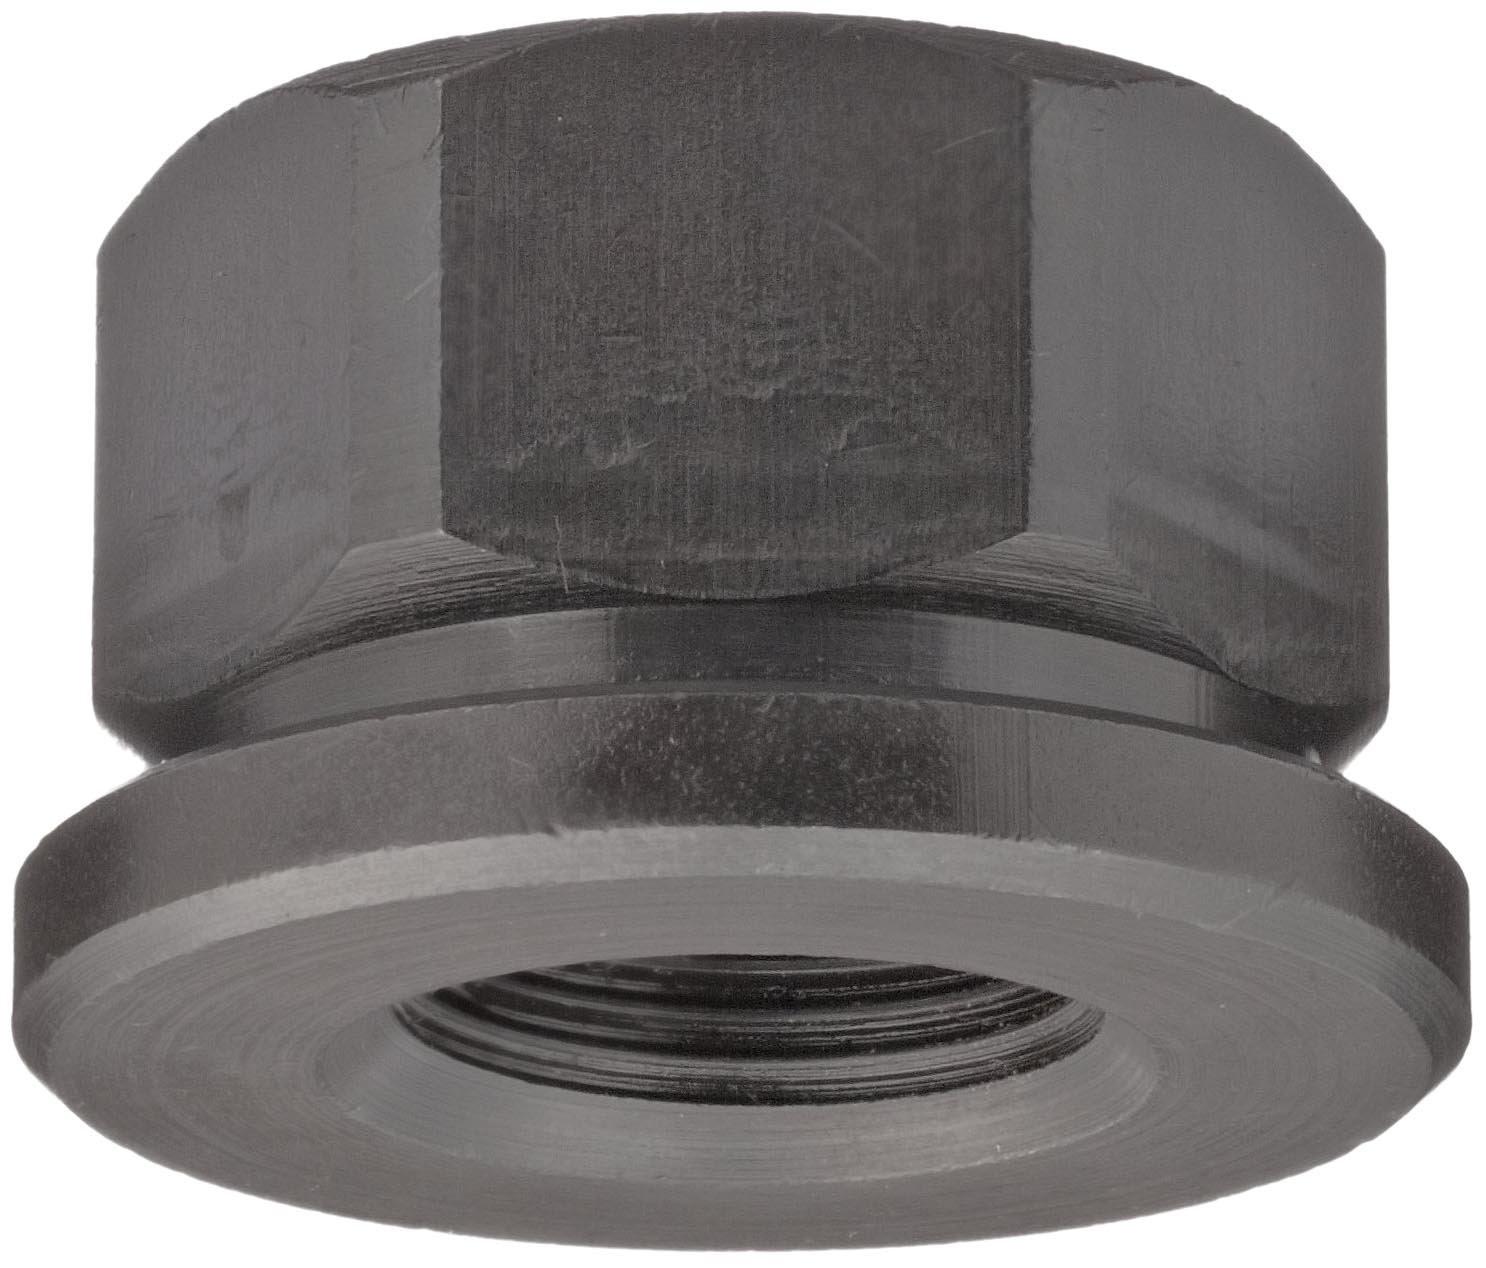 5//16-18x2 Quantity: 500 Plain Finish Grade 2 FT Flat Countersunk Head Elevator Bolt inch